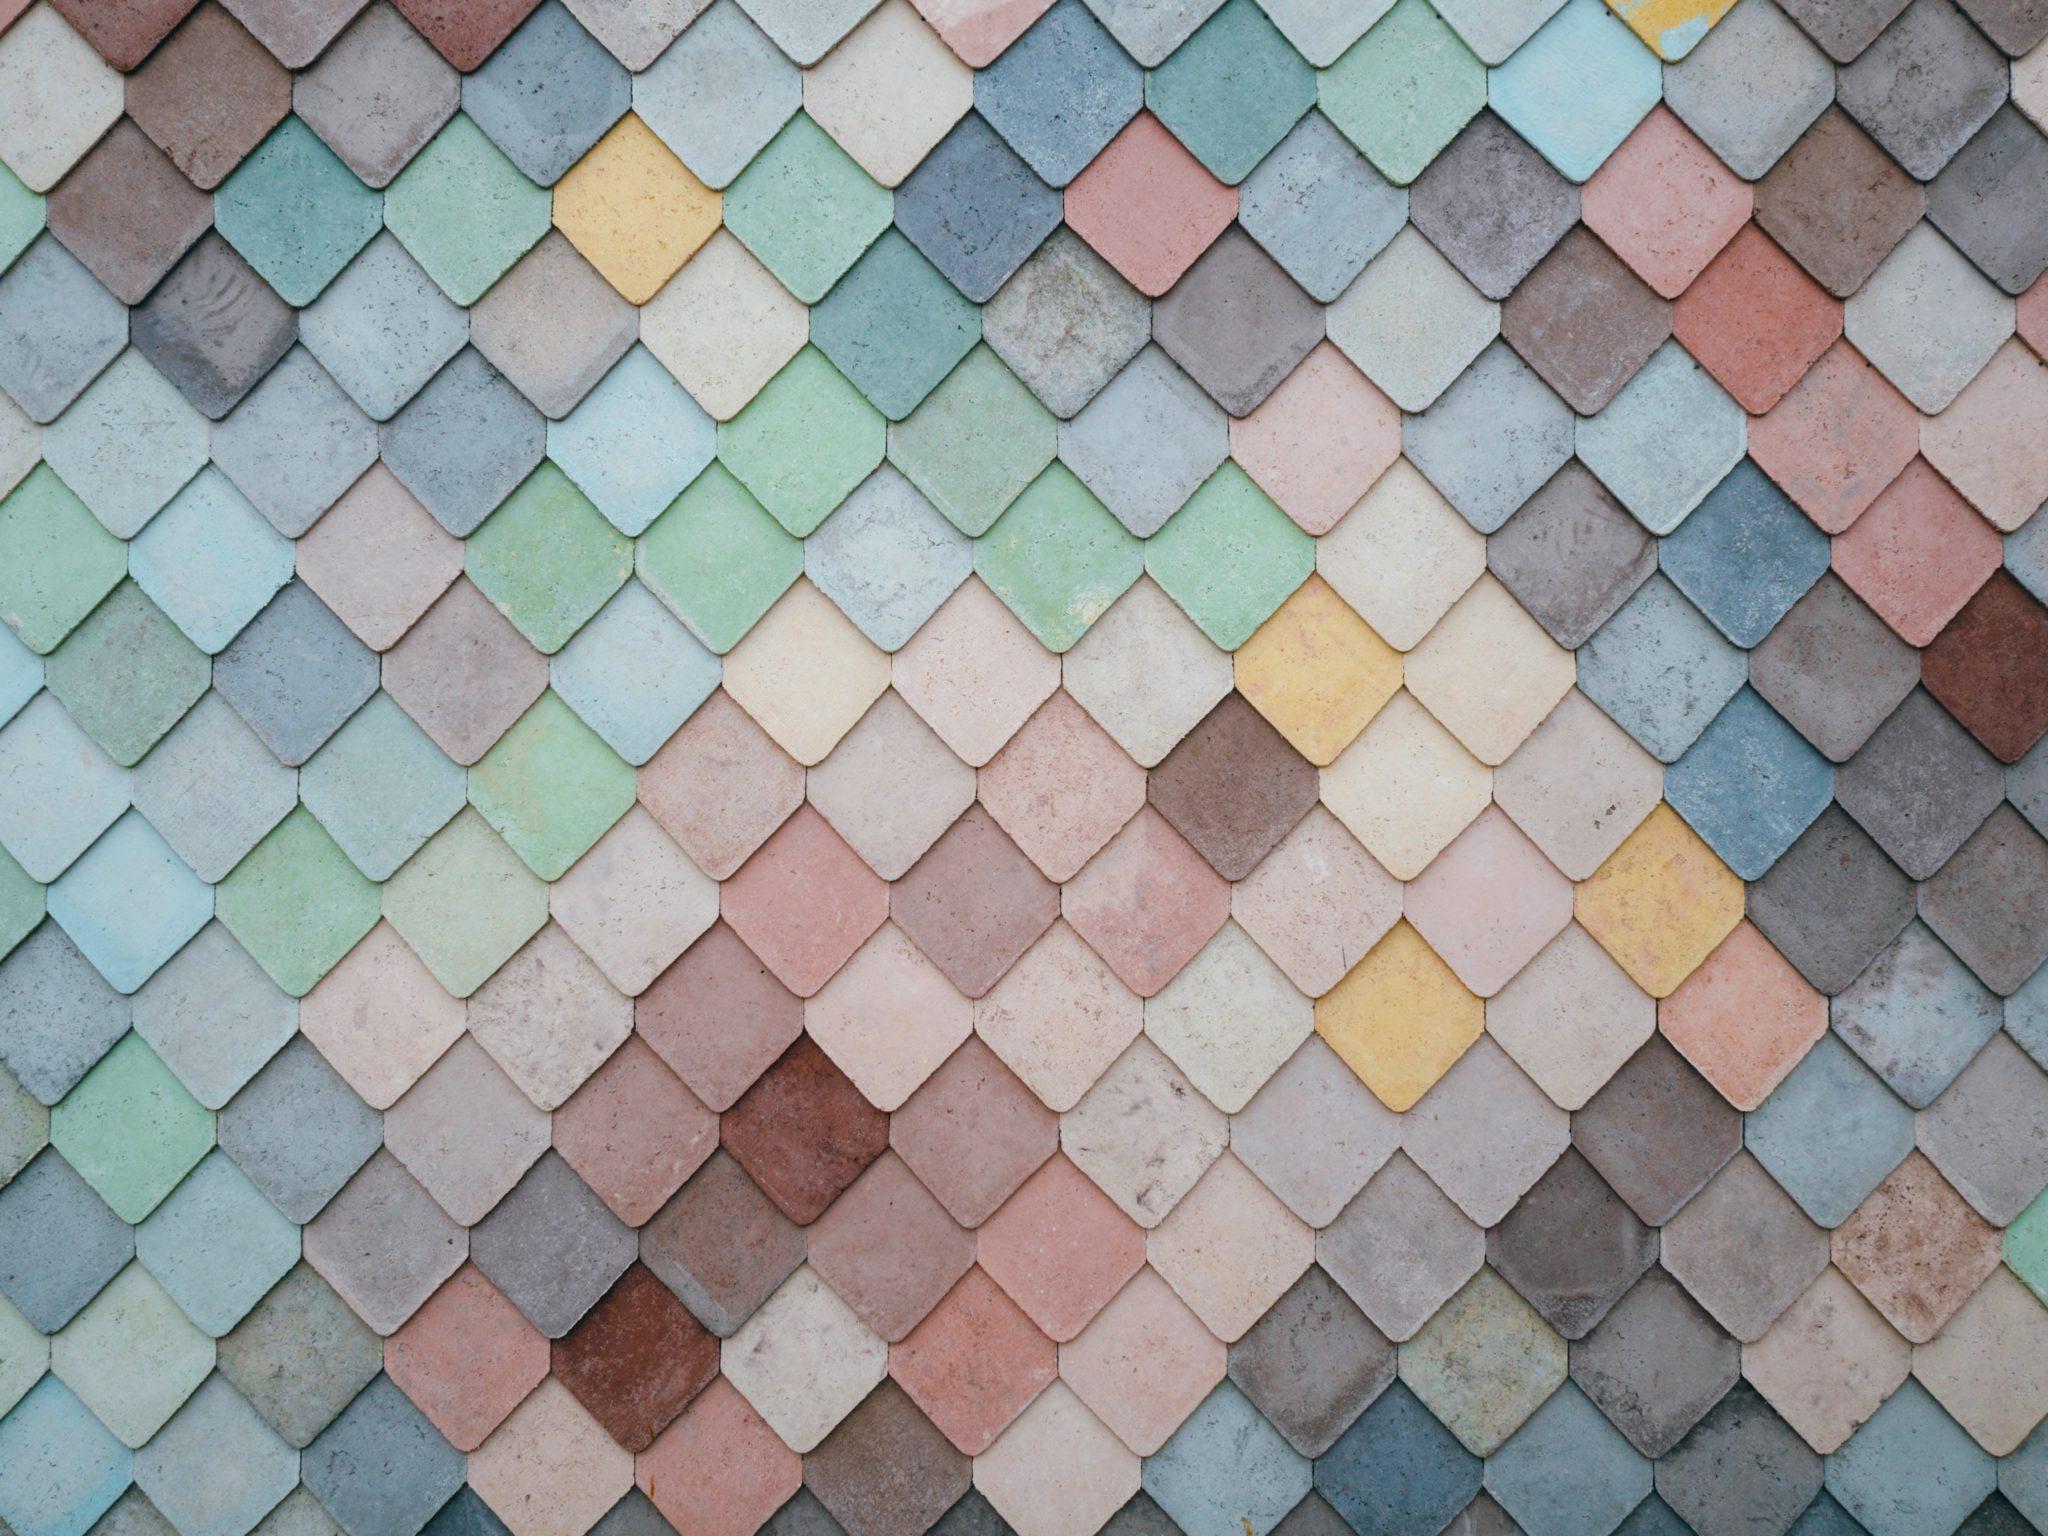 coloured pastel tiles like a brand mood board